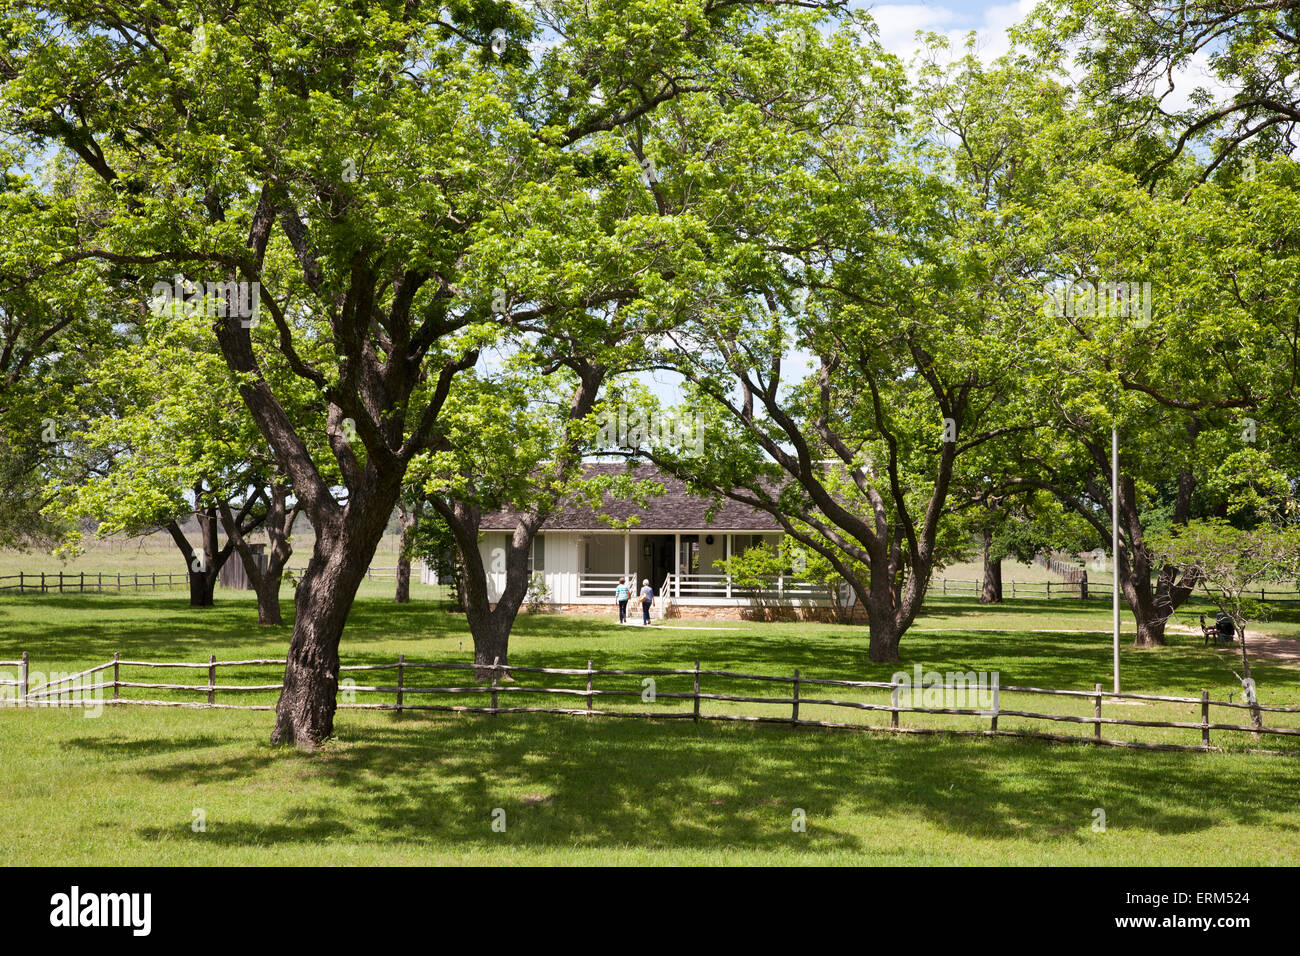 Reconstruction of Lyndon B. Johnson's Birthplace, LBJ Ranch National Historic Site, Stonewall, Texas. Stock Photo